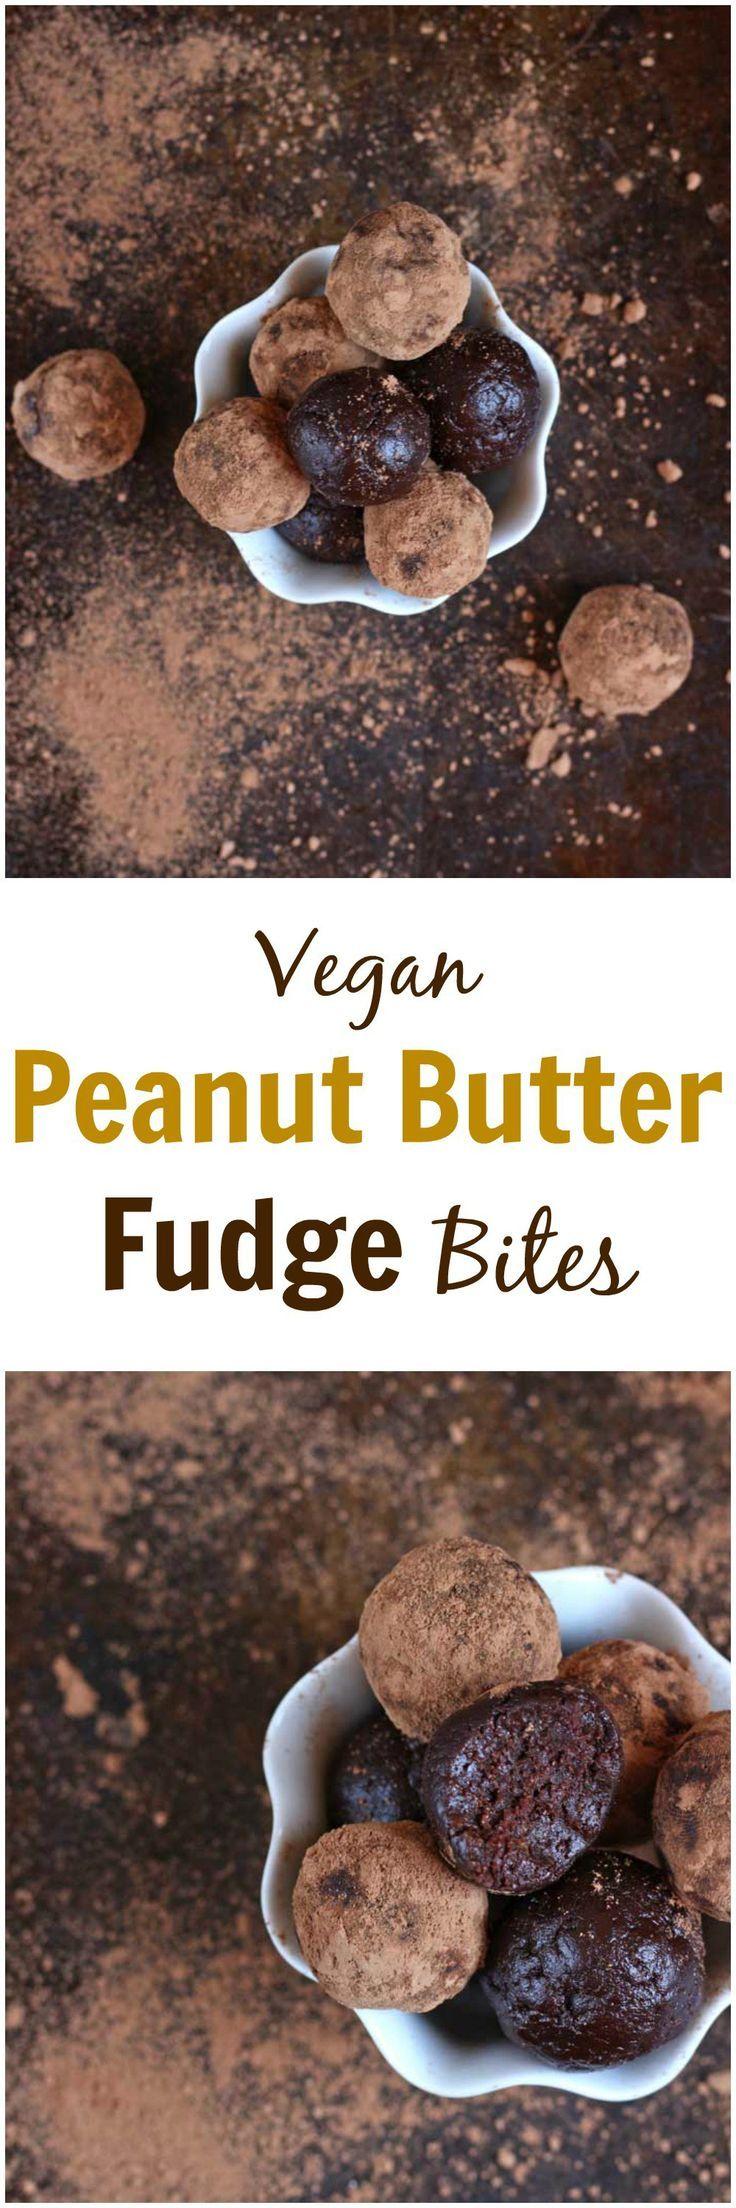 ... Peanut Butter Fudge on Pinterest | Fudge, Fudge Recipes and Peanut